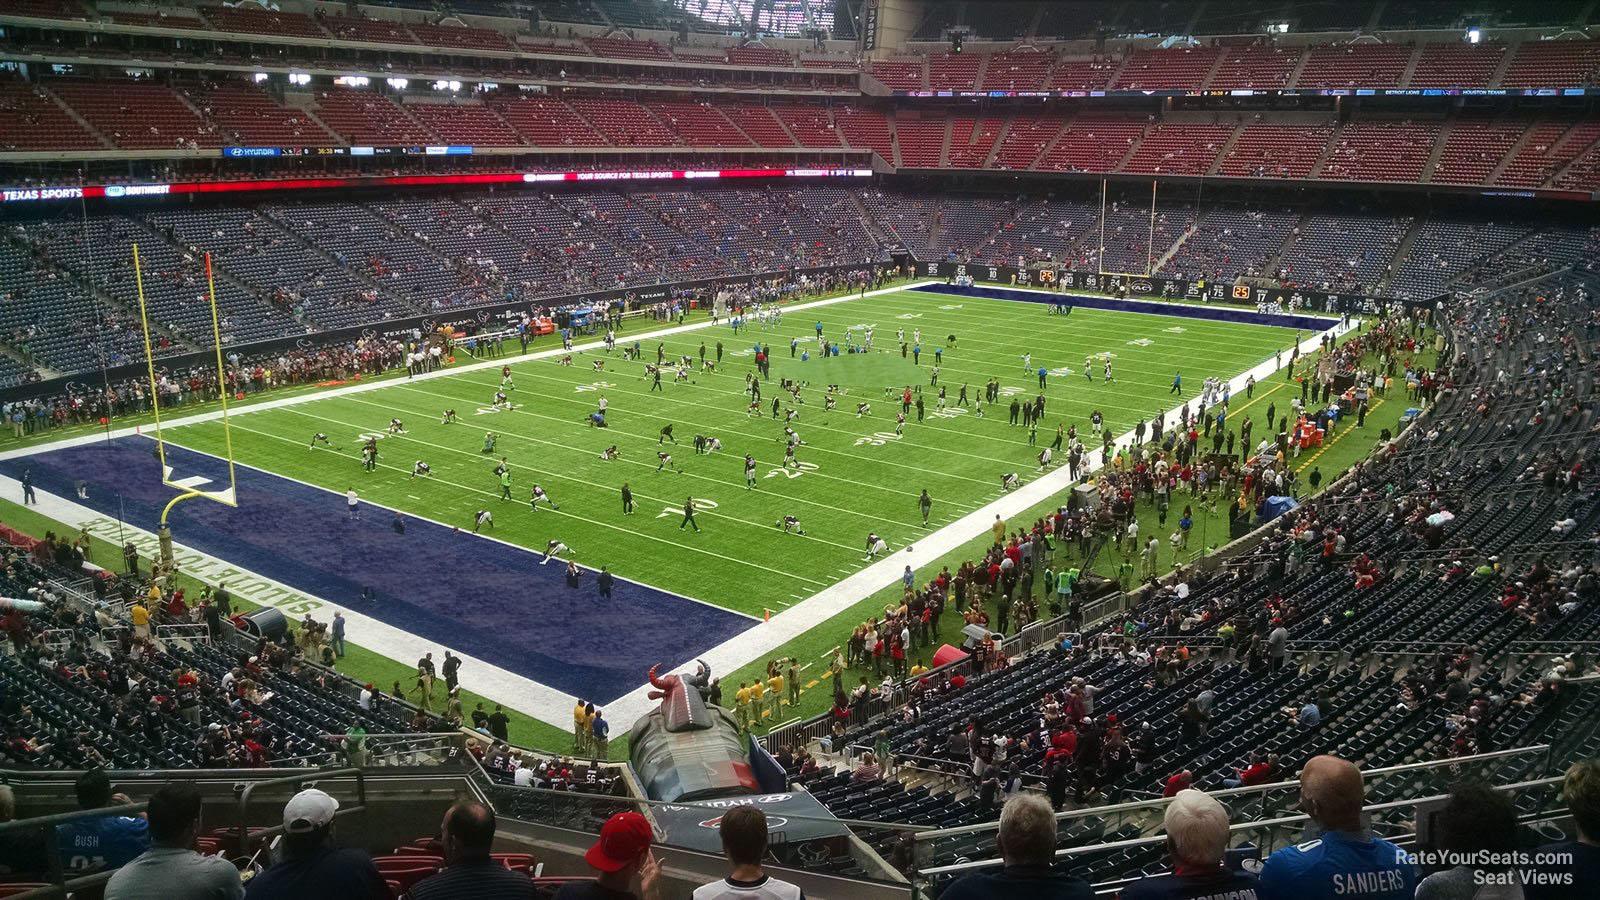 West Houston Vw >> NRG Stadium Section 317 - Houston Texans - RateYourSeats.com